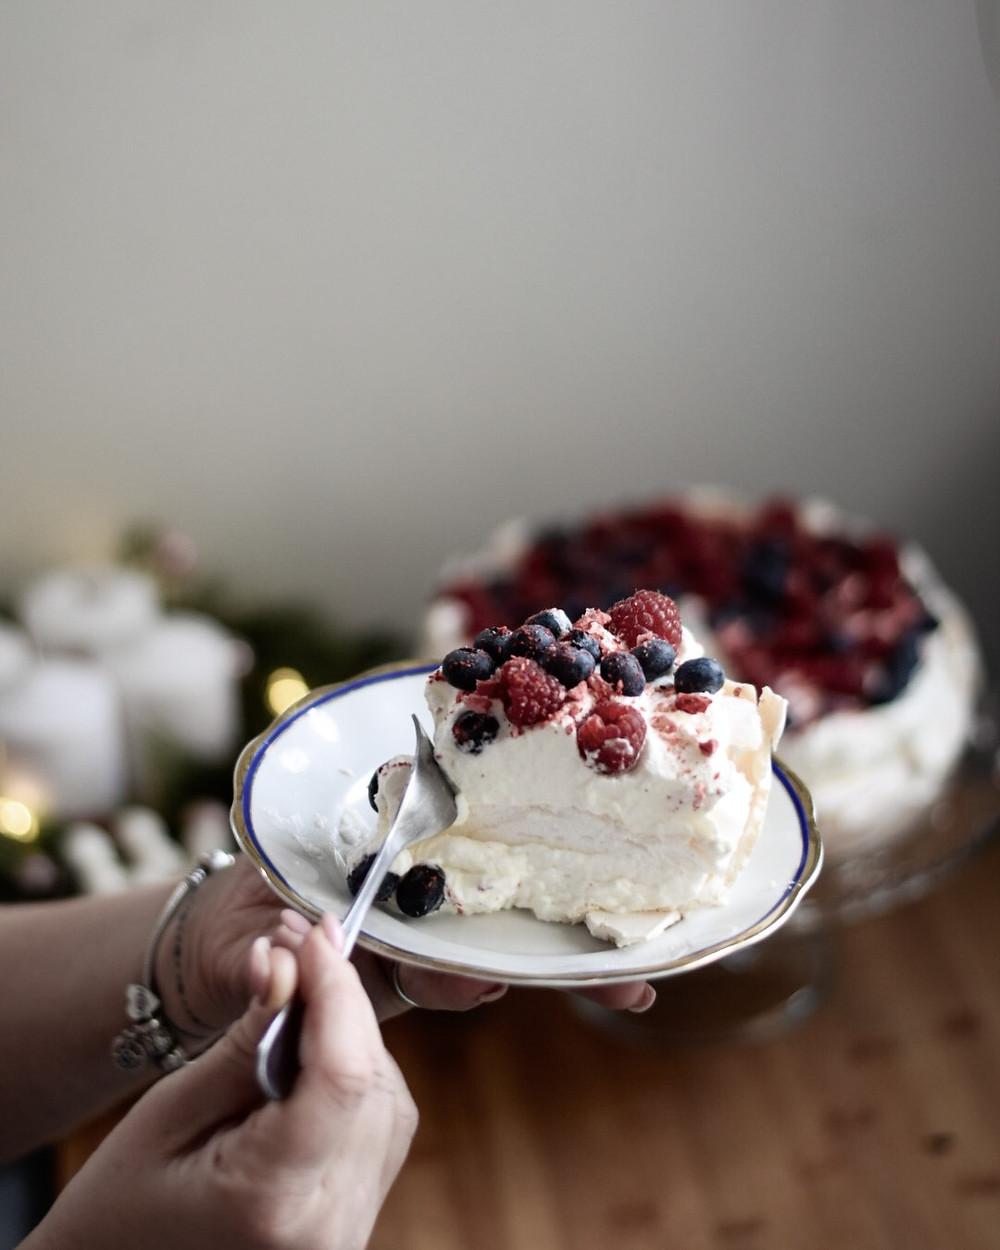 pavlova, torta, helenine čarovnije, recept za torto, biskvit za torto, biskvit za torto ki ne pade dol, rojstnodnevna torta, partypek, partipek, sladke želje, ulline dobrote, yummy tammy, sweetina, torta, božična pojedina, #mojBosch, #boschinfluencer, big bang